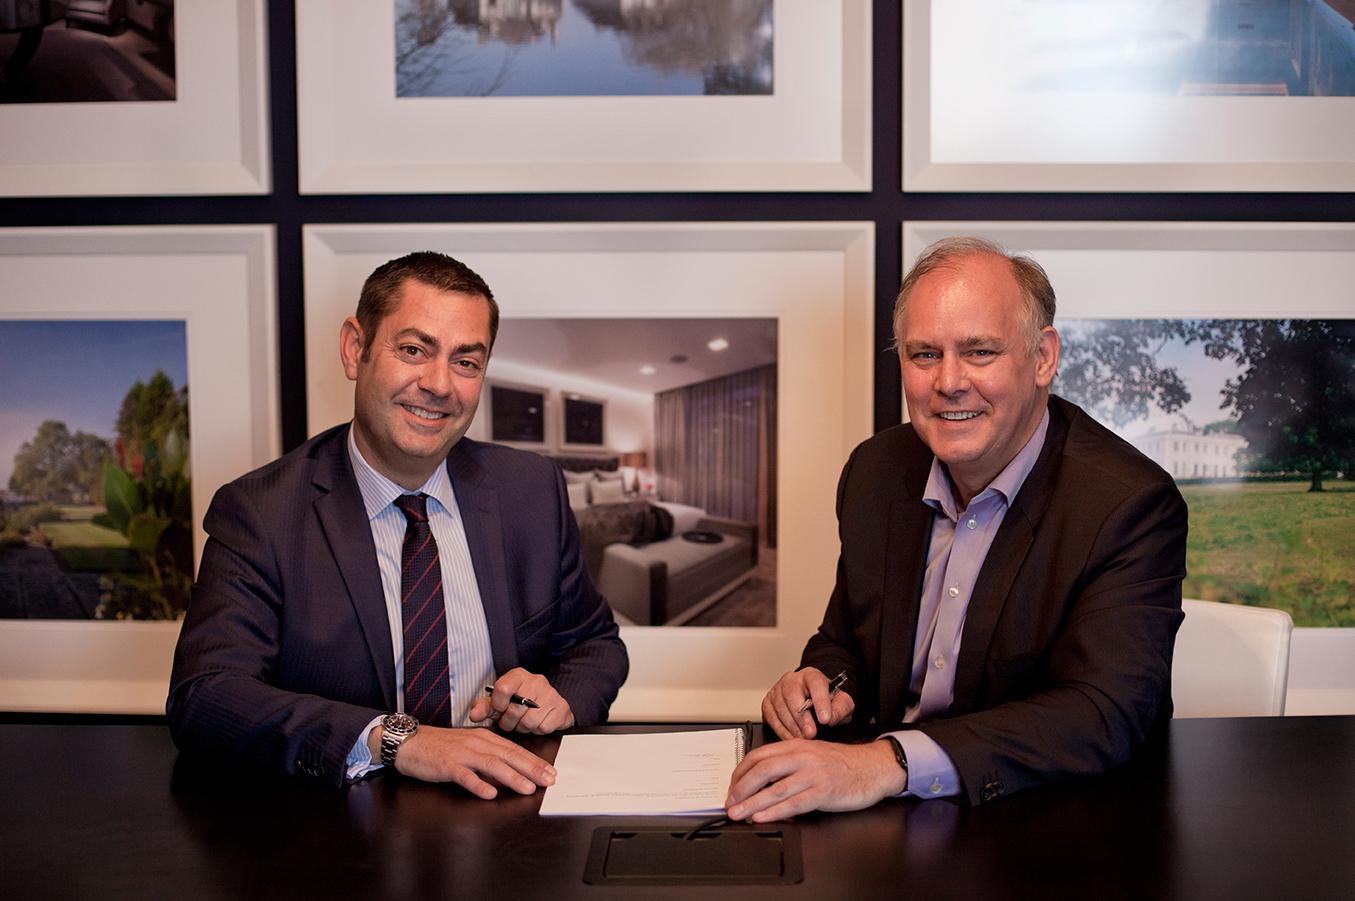 Zycko joins the Nokia Global Partner Program